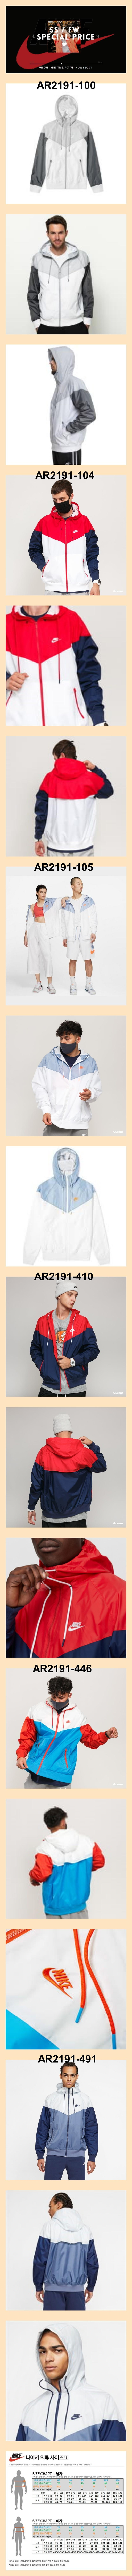 AR2191_TOTAL.jpg